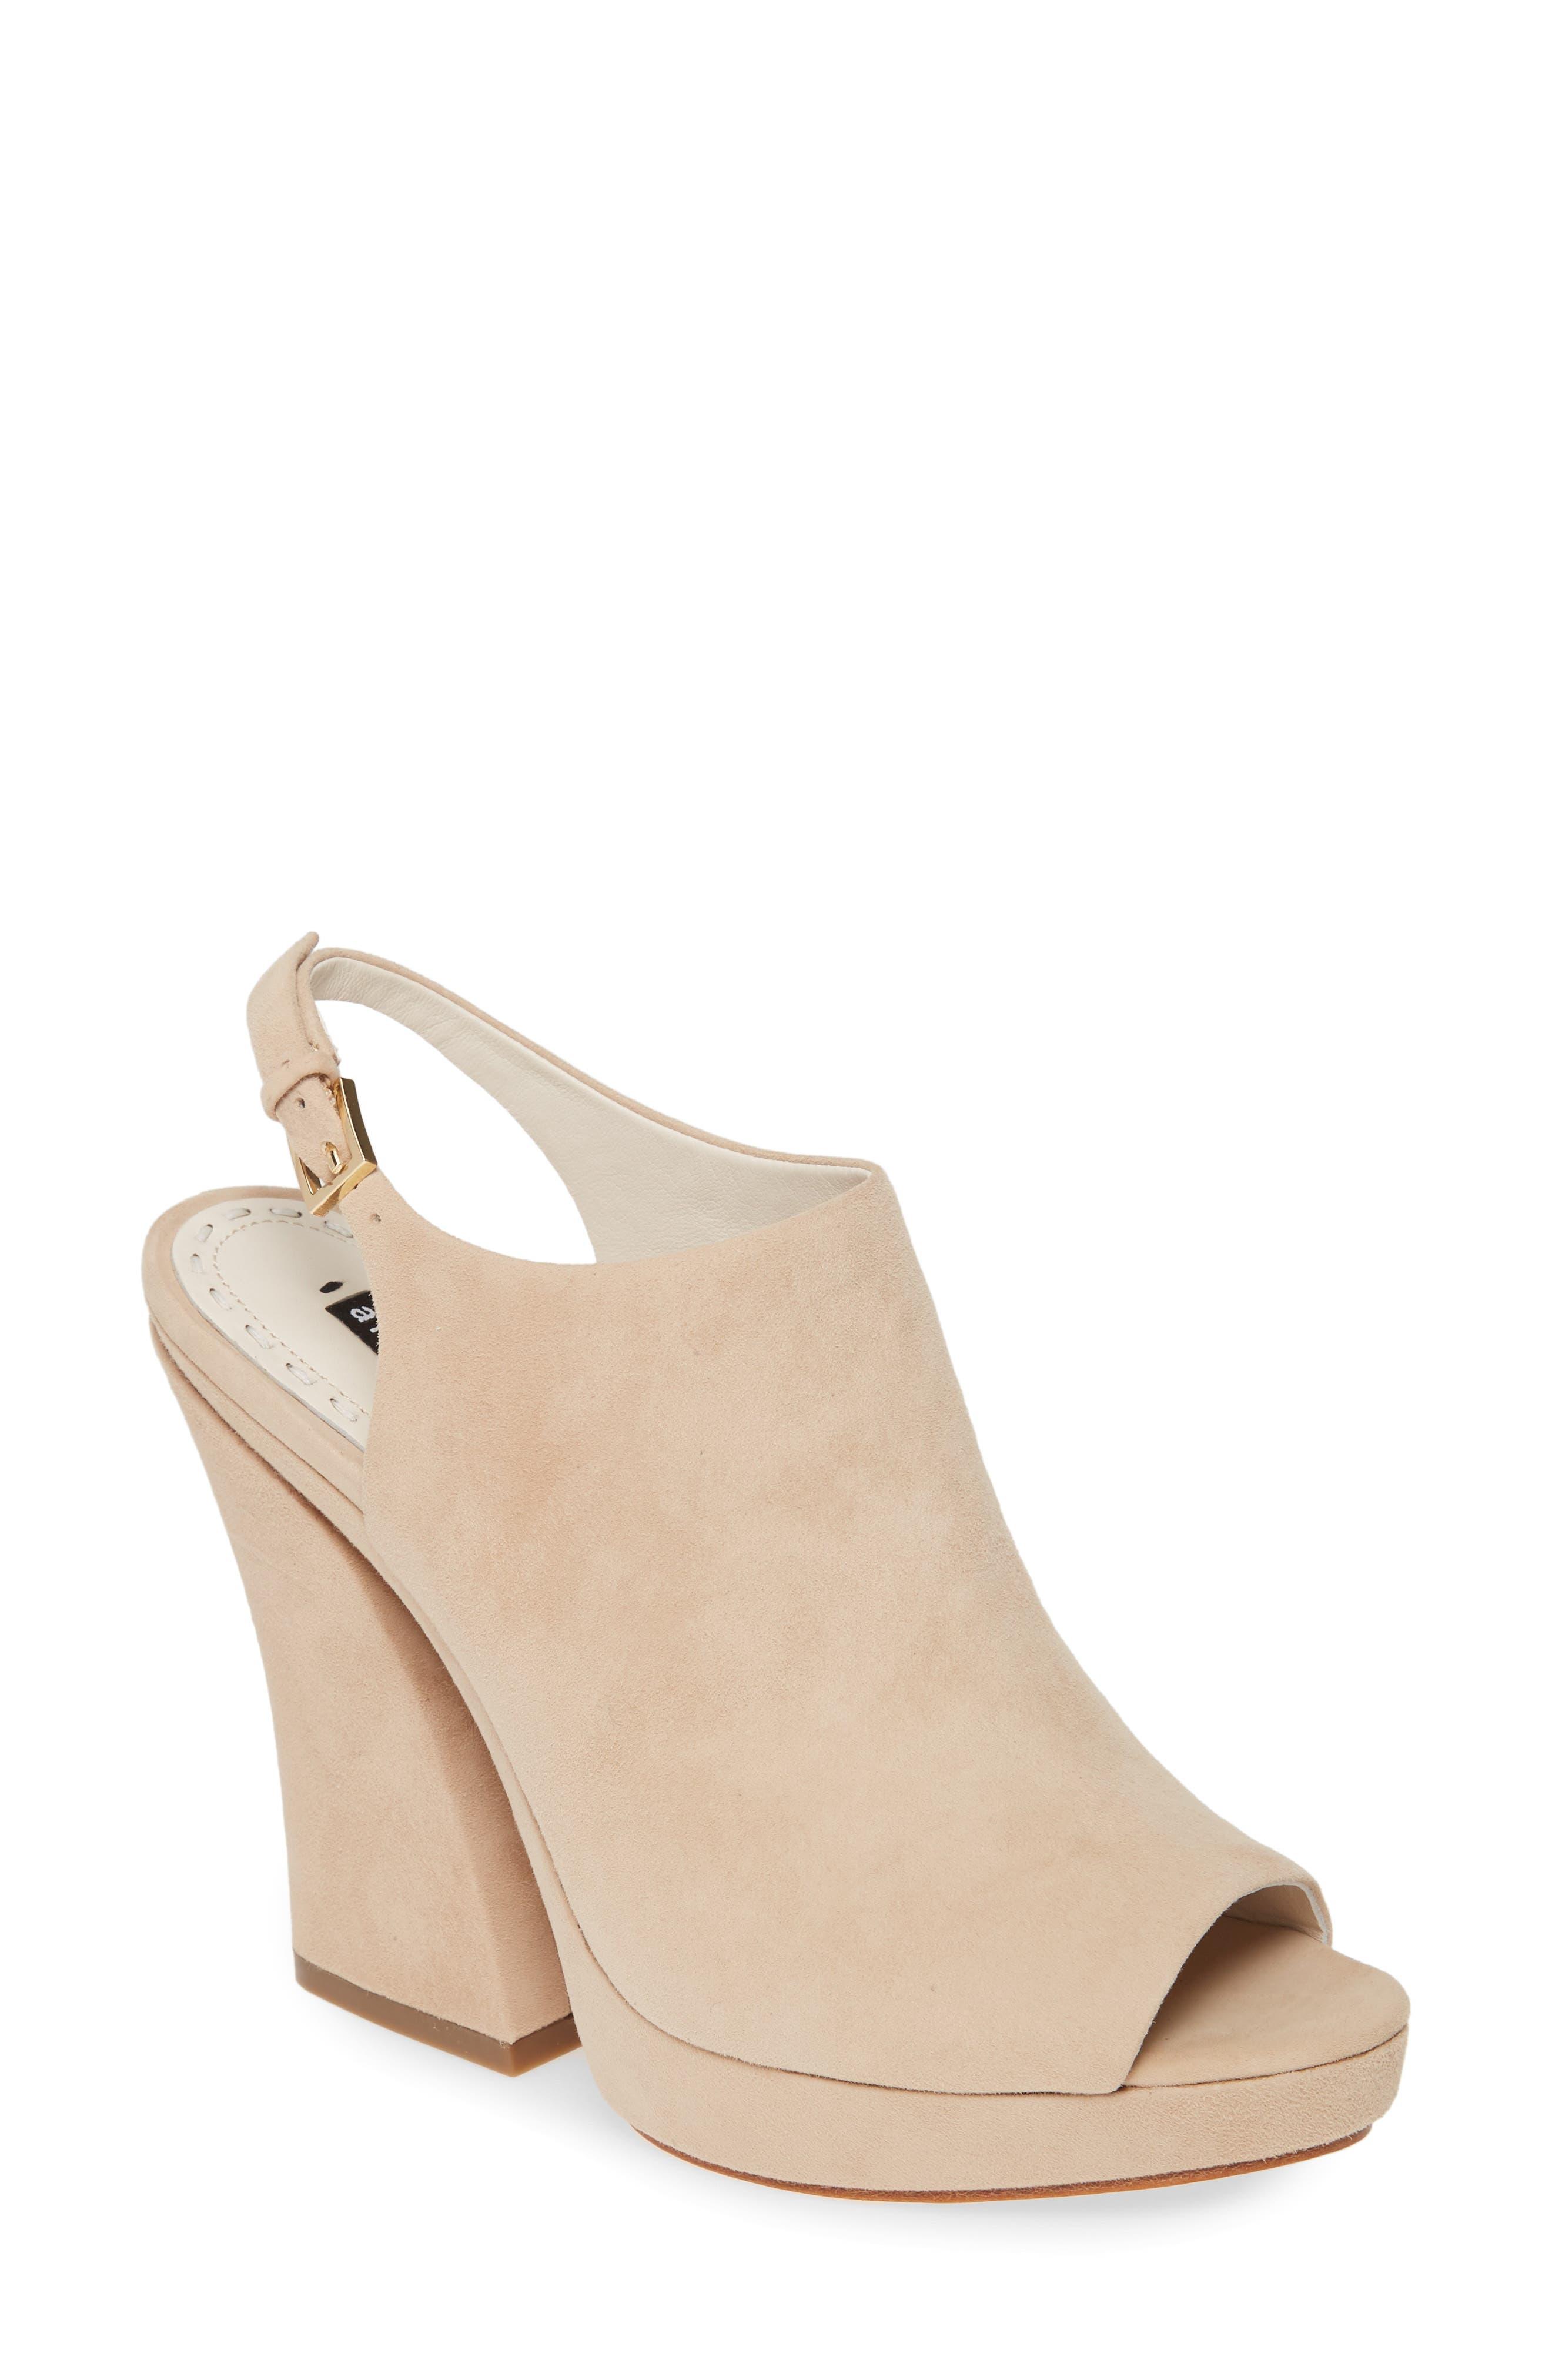 Alice + Olivia Slippers Saund Open Toe Sandal